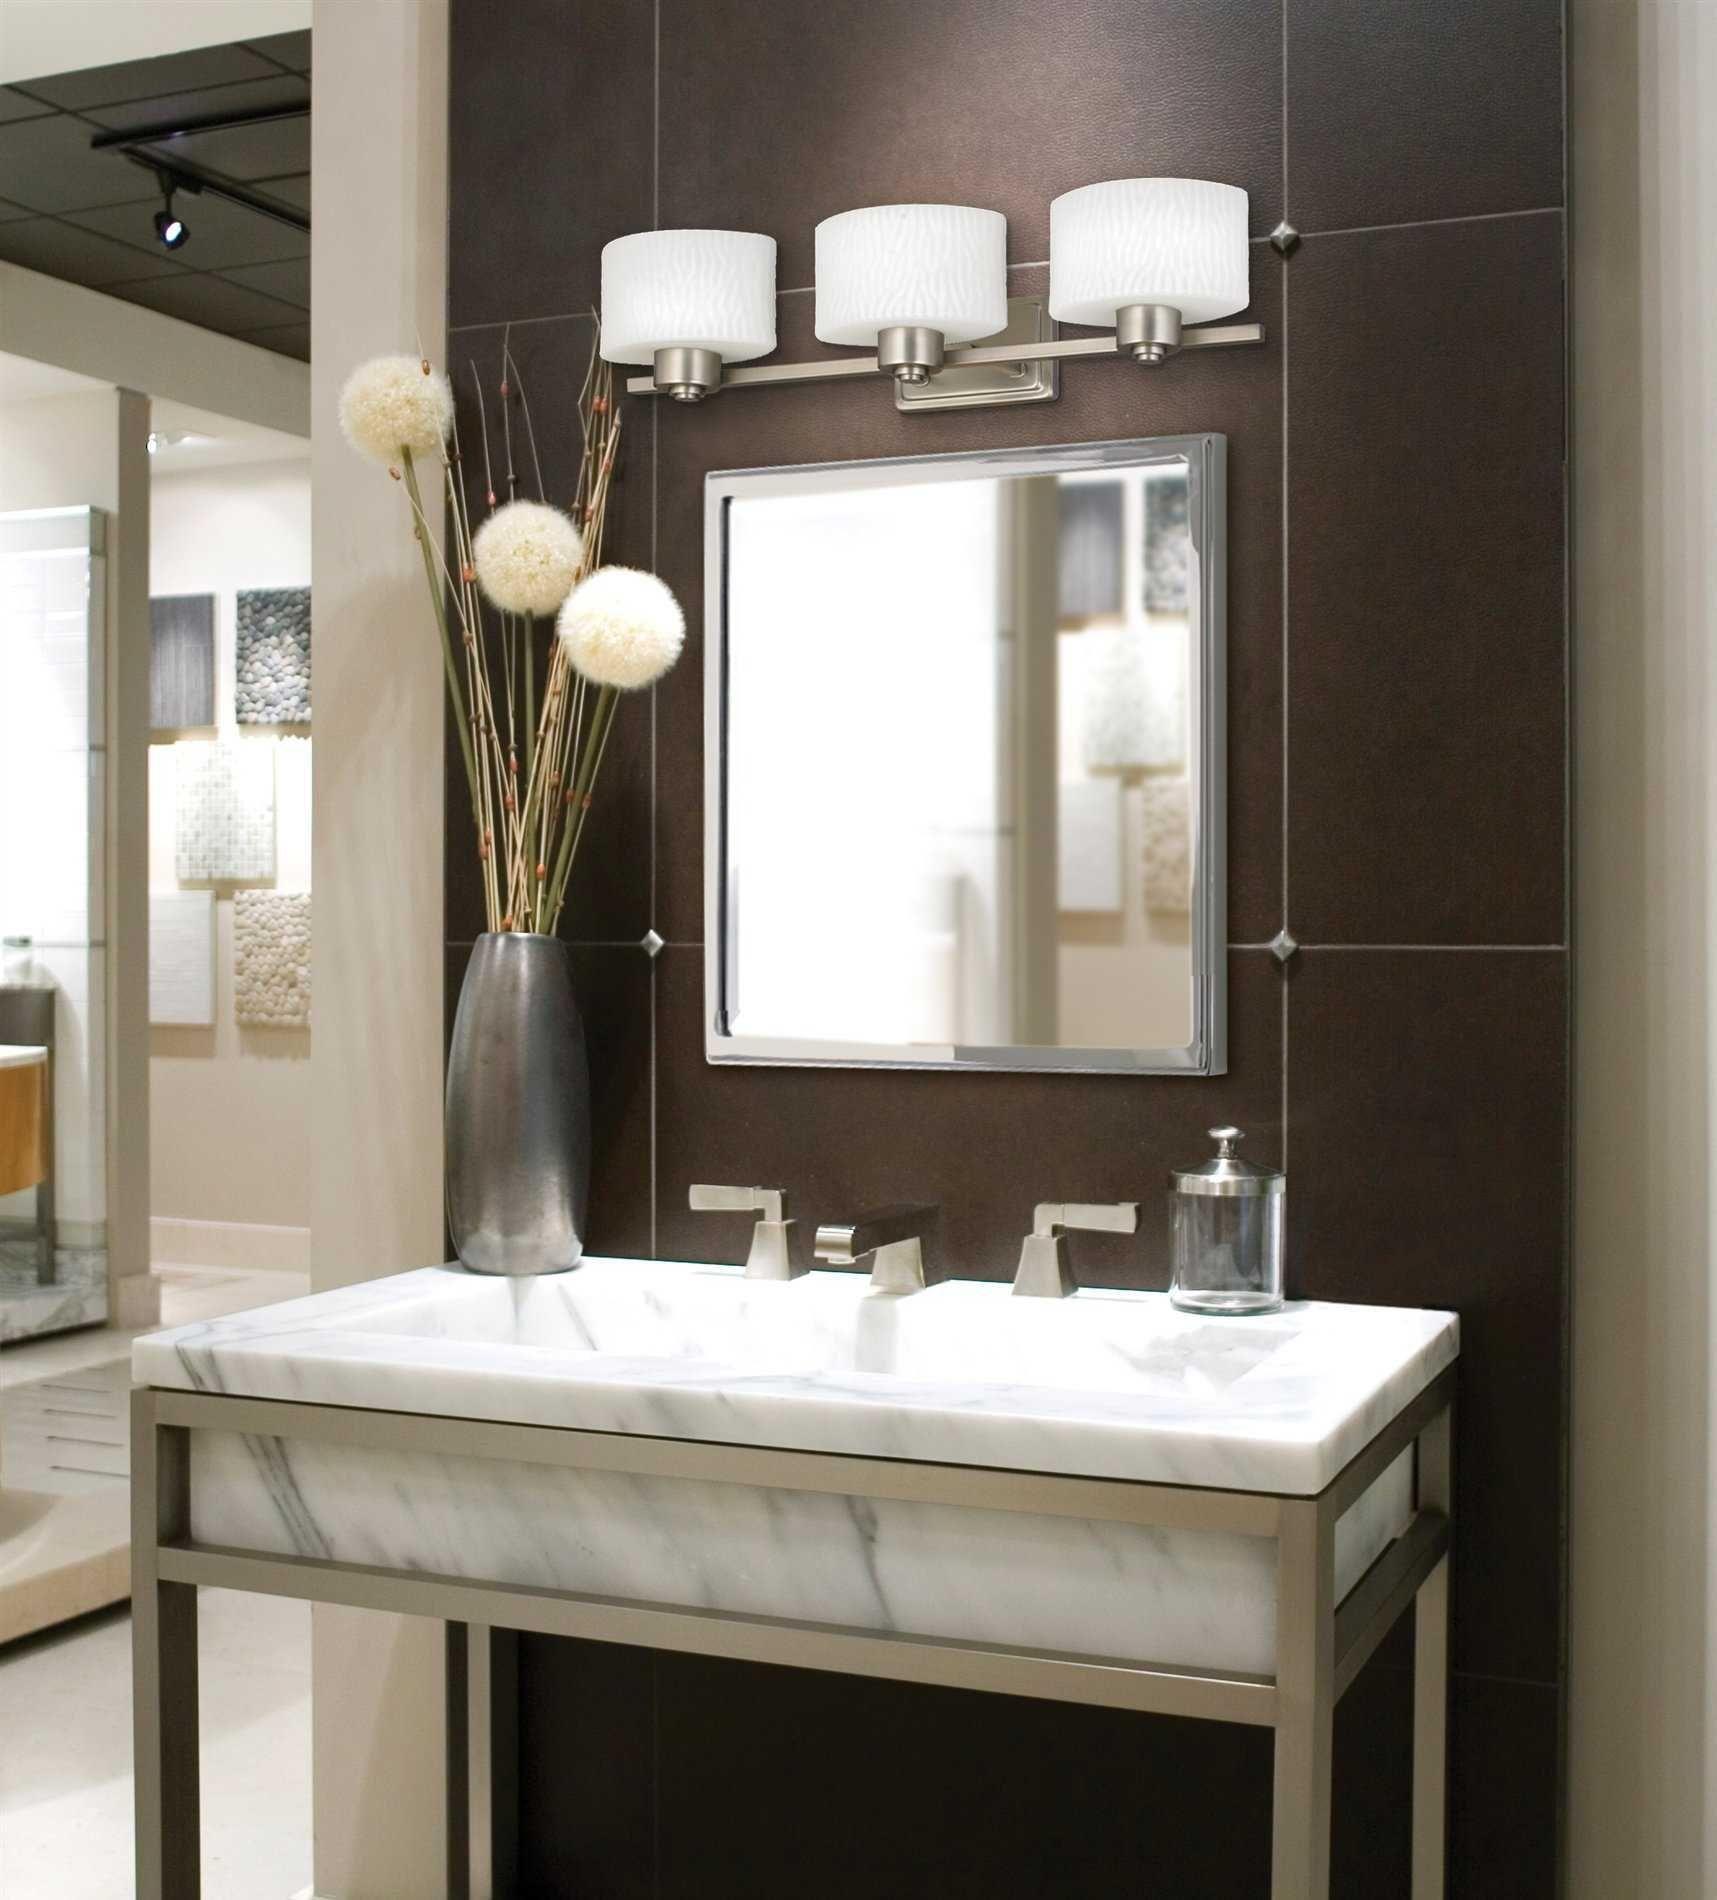 24 Luxury Vanity Mirror With Lights Ideas Contemporary Bathroom Lighting Best Bathroom Lighting Modern Bathroom Vanity Lighting